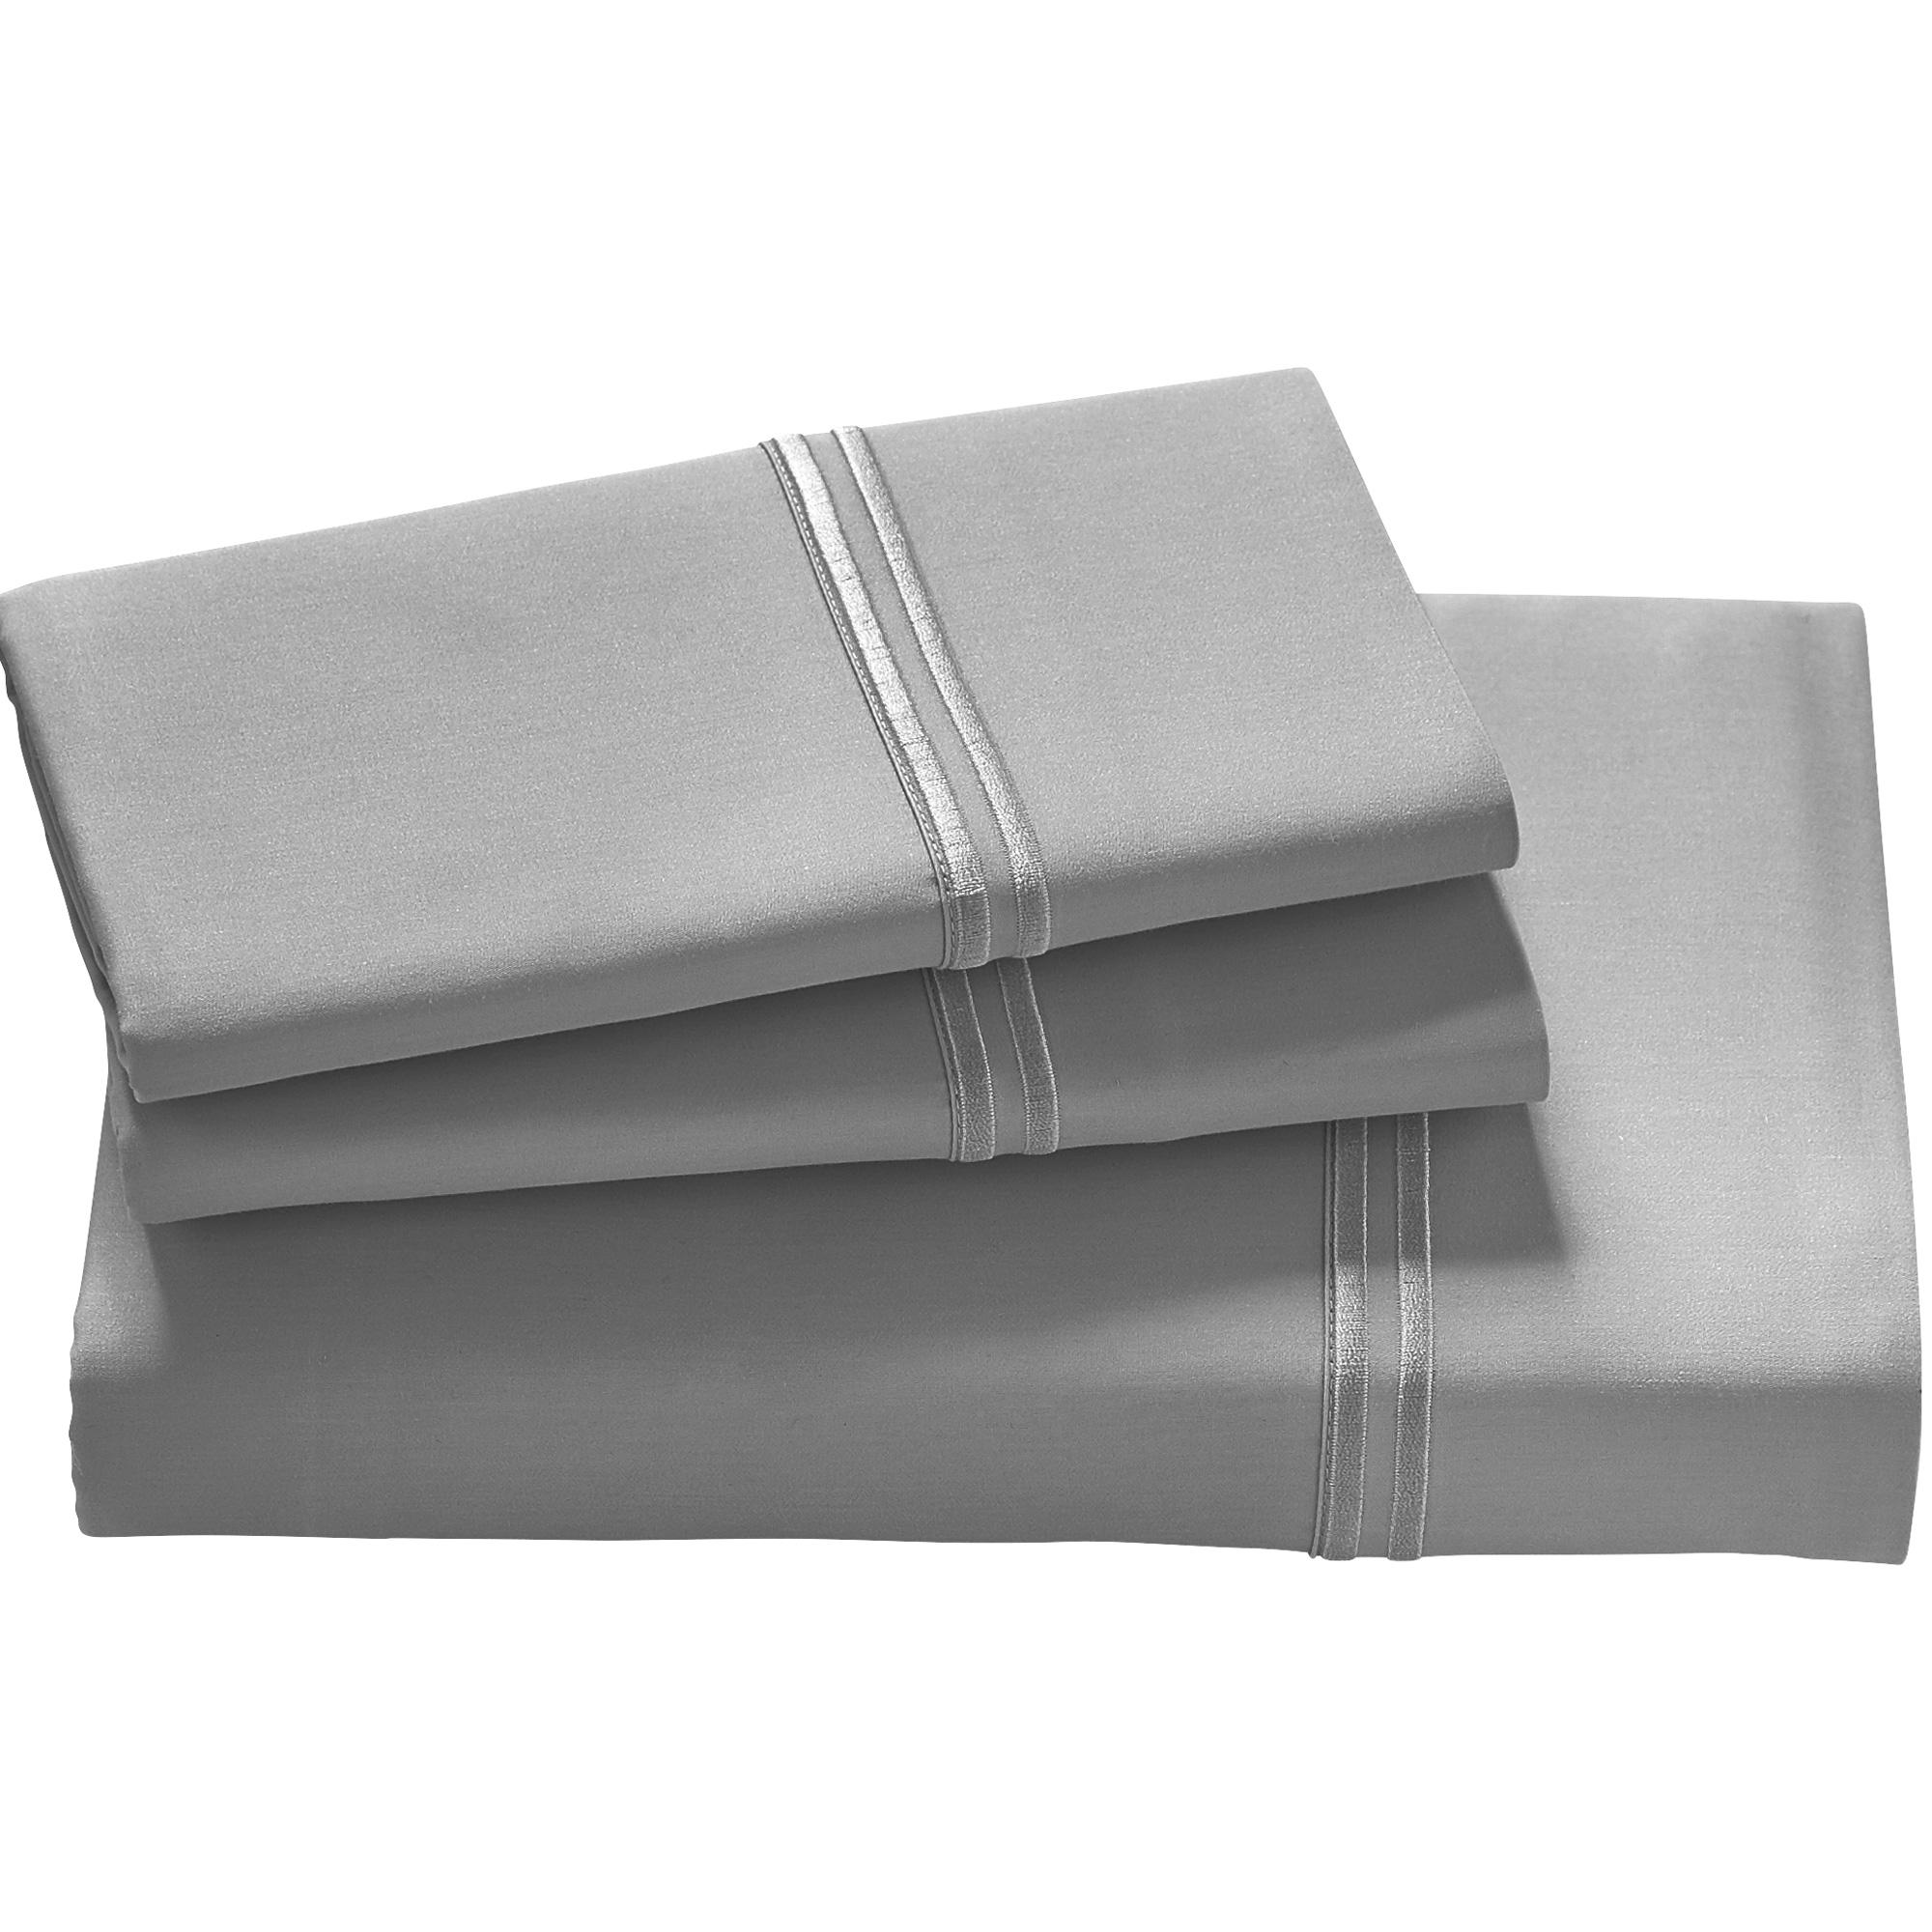 Purecare | Elements Dove Gray Queen Modal Sheet Set